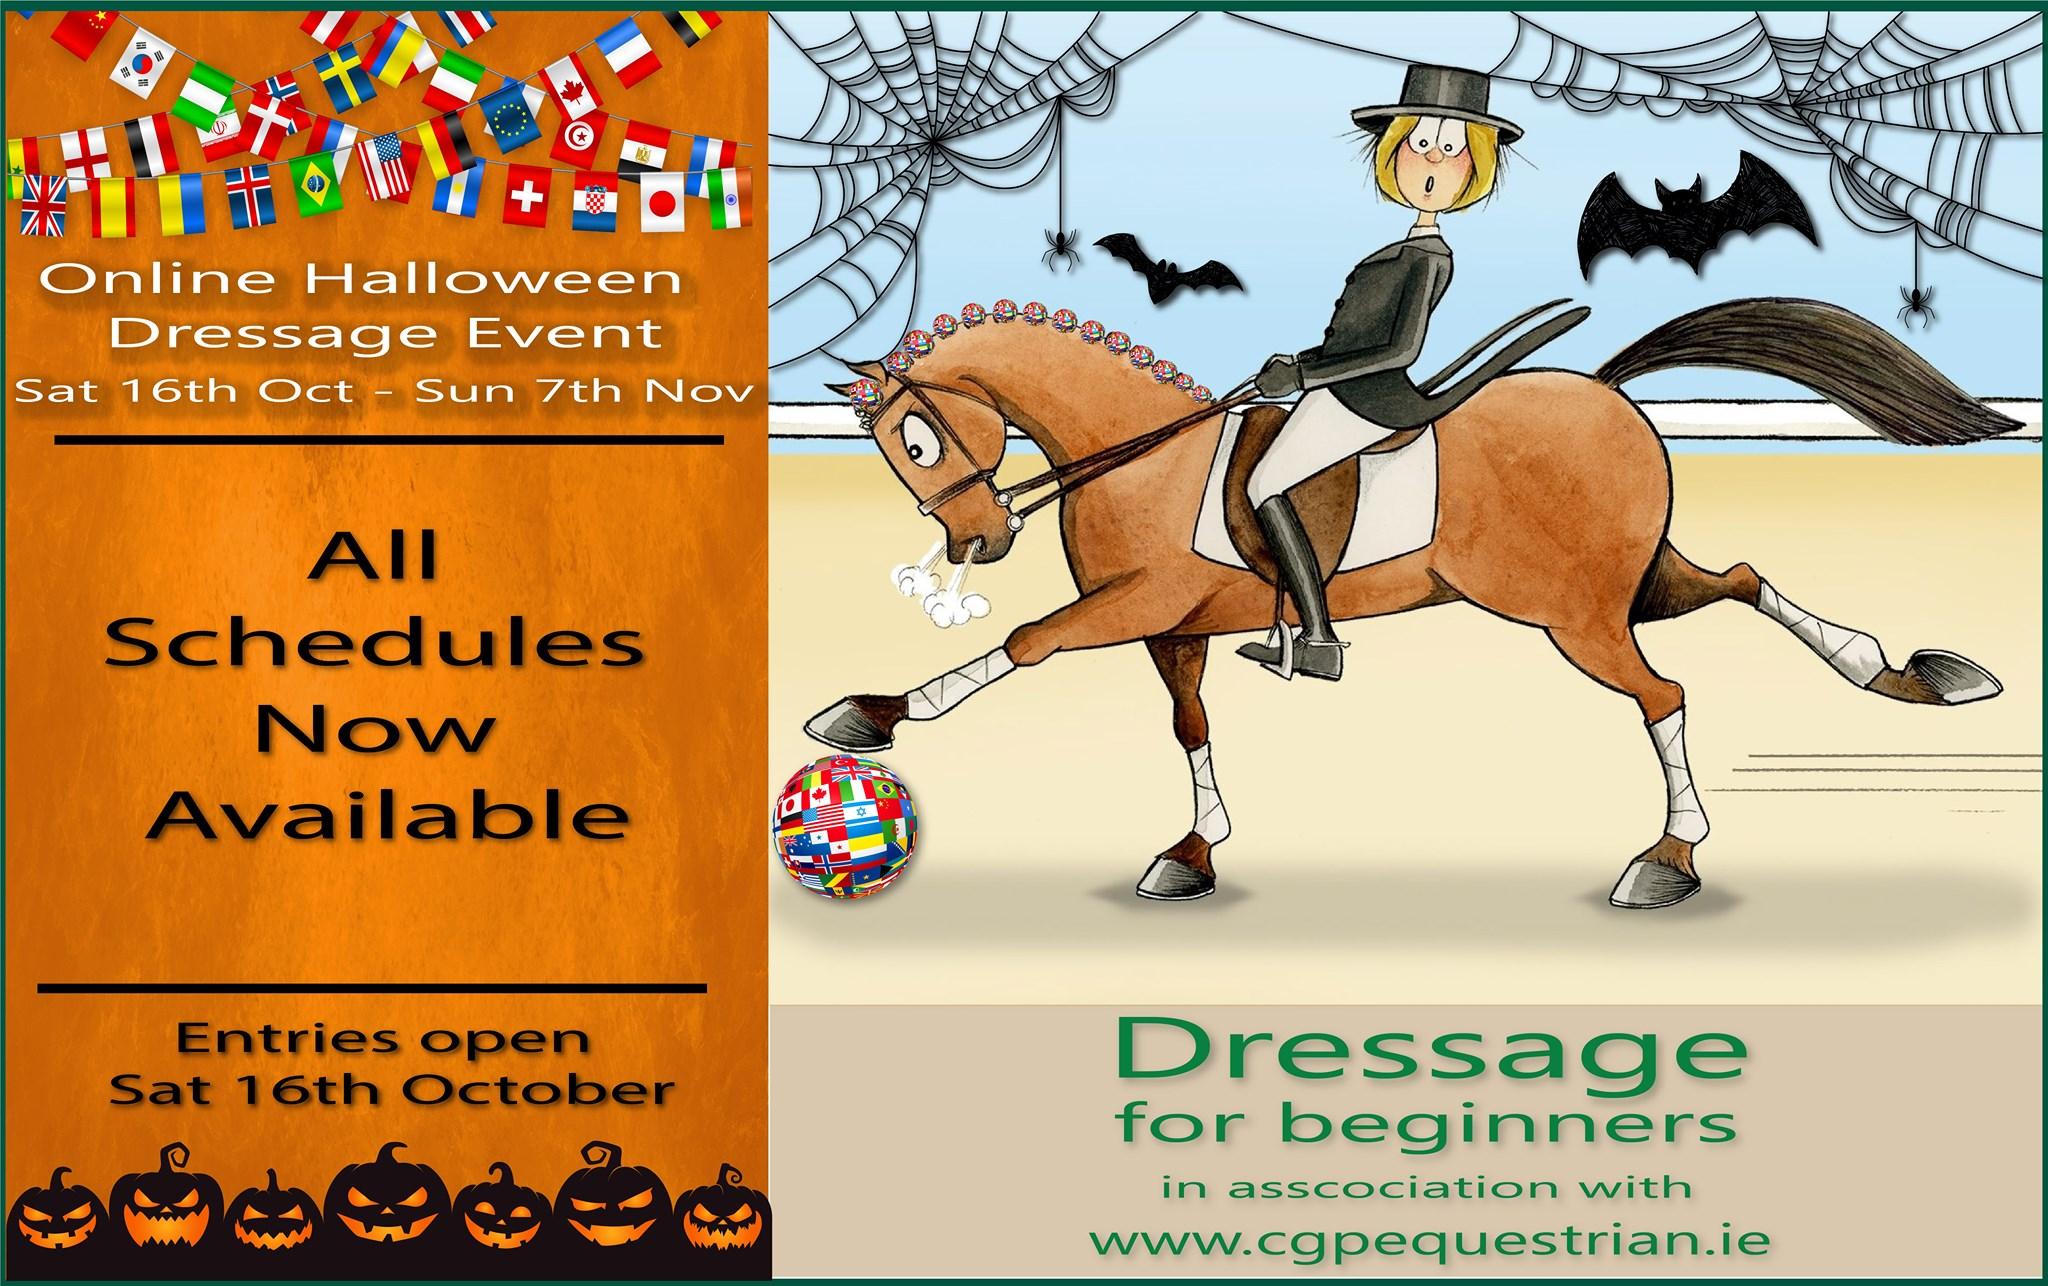 Online Halloween Dressage Event